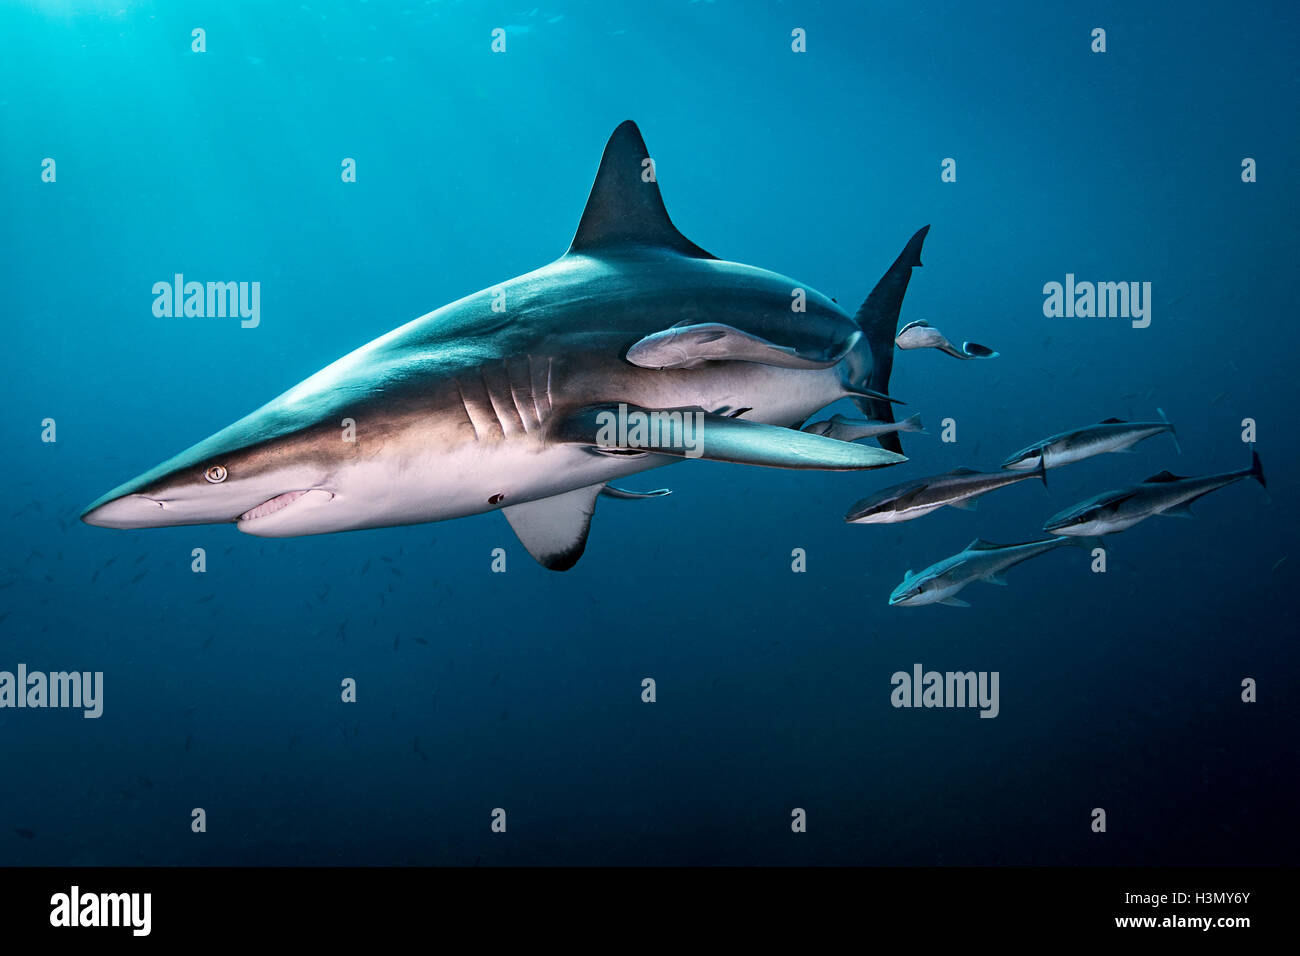 Oceanic Blacktip Shark (Carcharhinus Limbatus) swimming near surface of ocean, Aliwal Shoal, South Africa Stock Photo